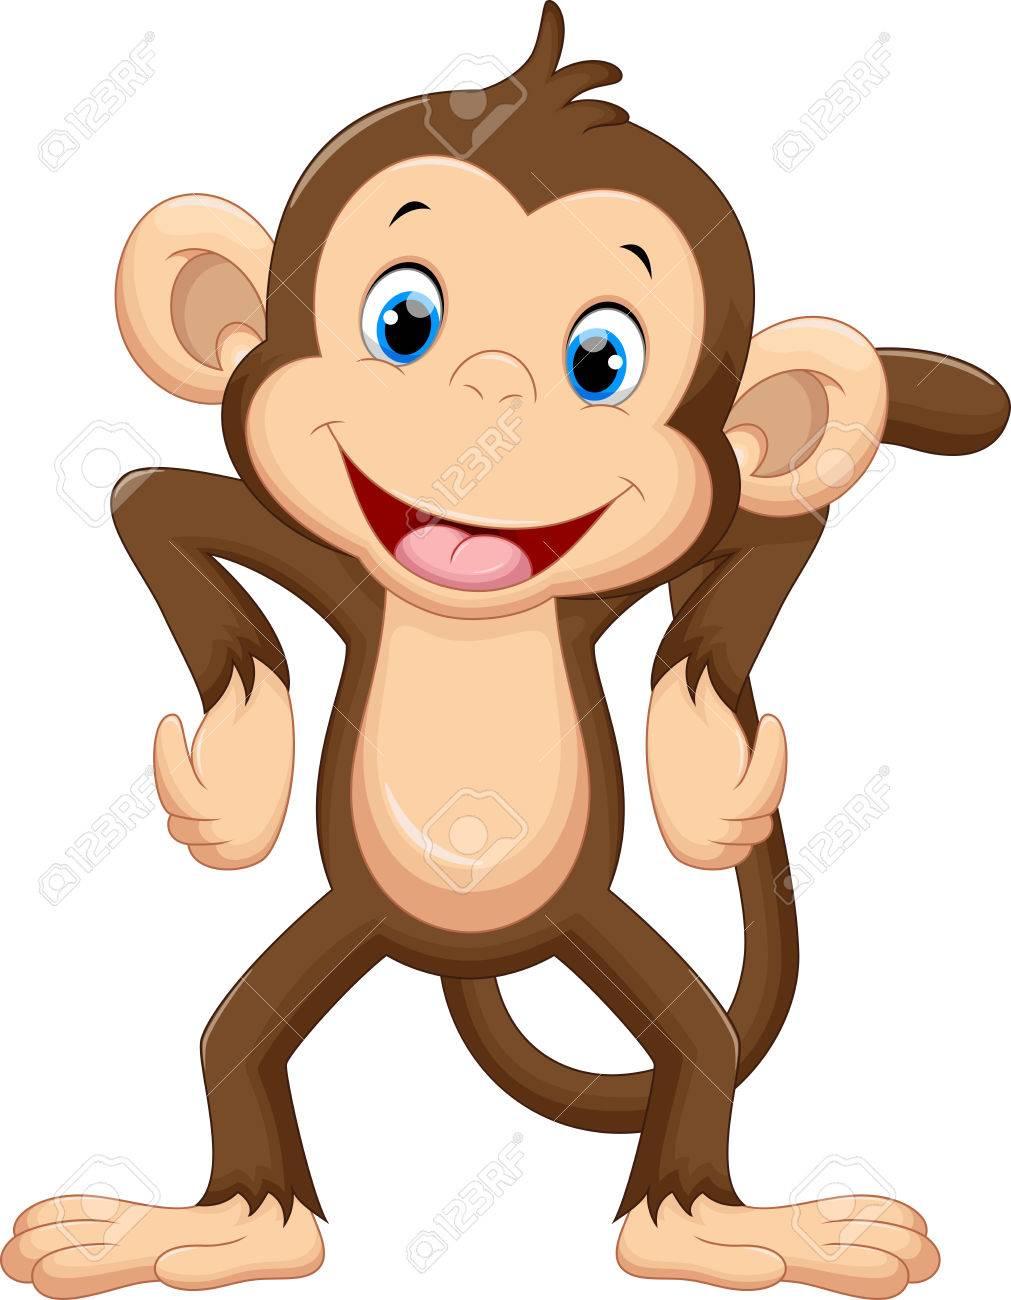 Cute monkey cartoon - 50993718